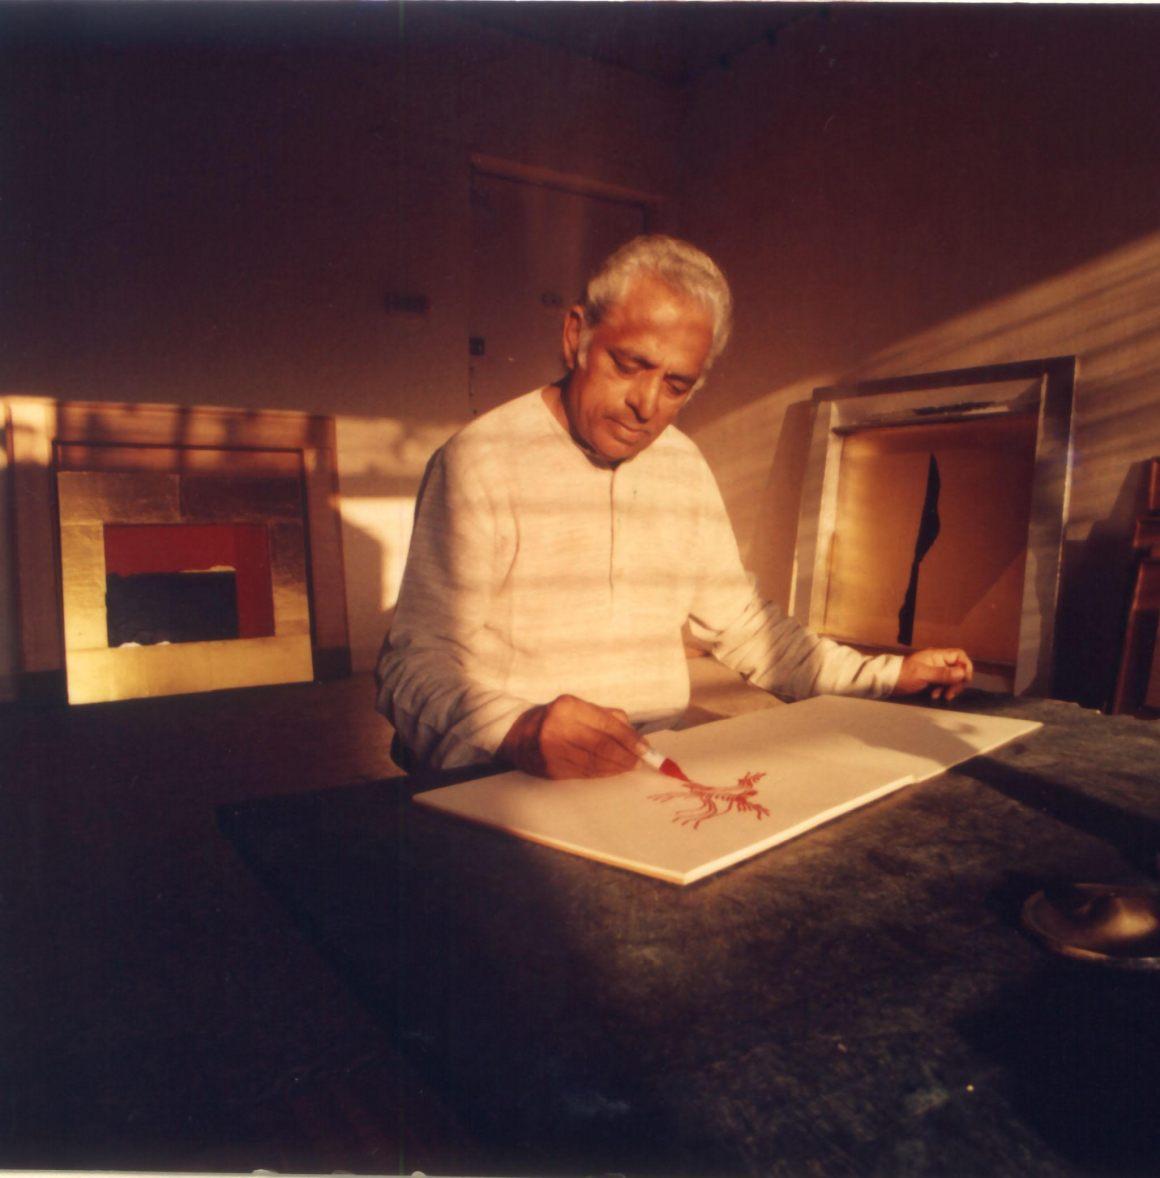 Dashrath Patel (October 6, 1927- December 1, 2010. Credit: Sadanand Menon